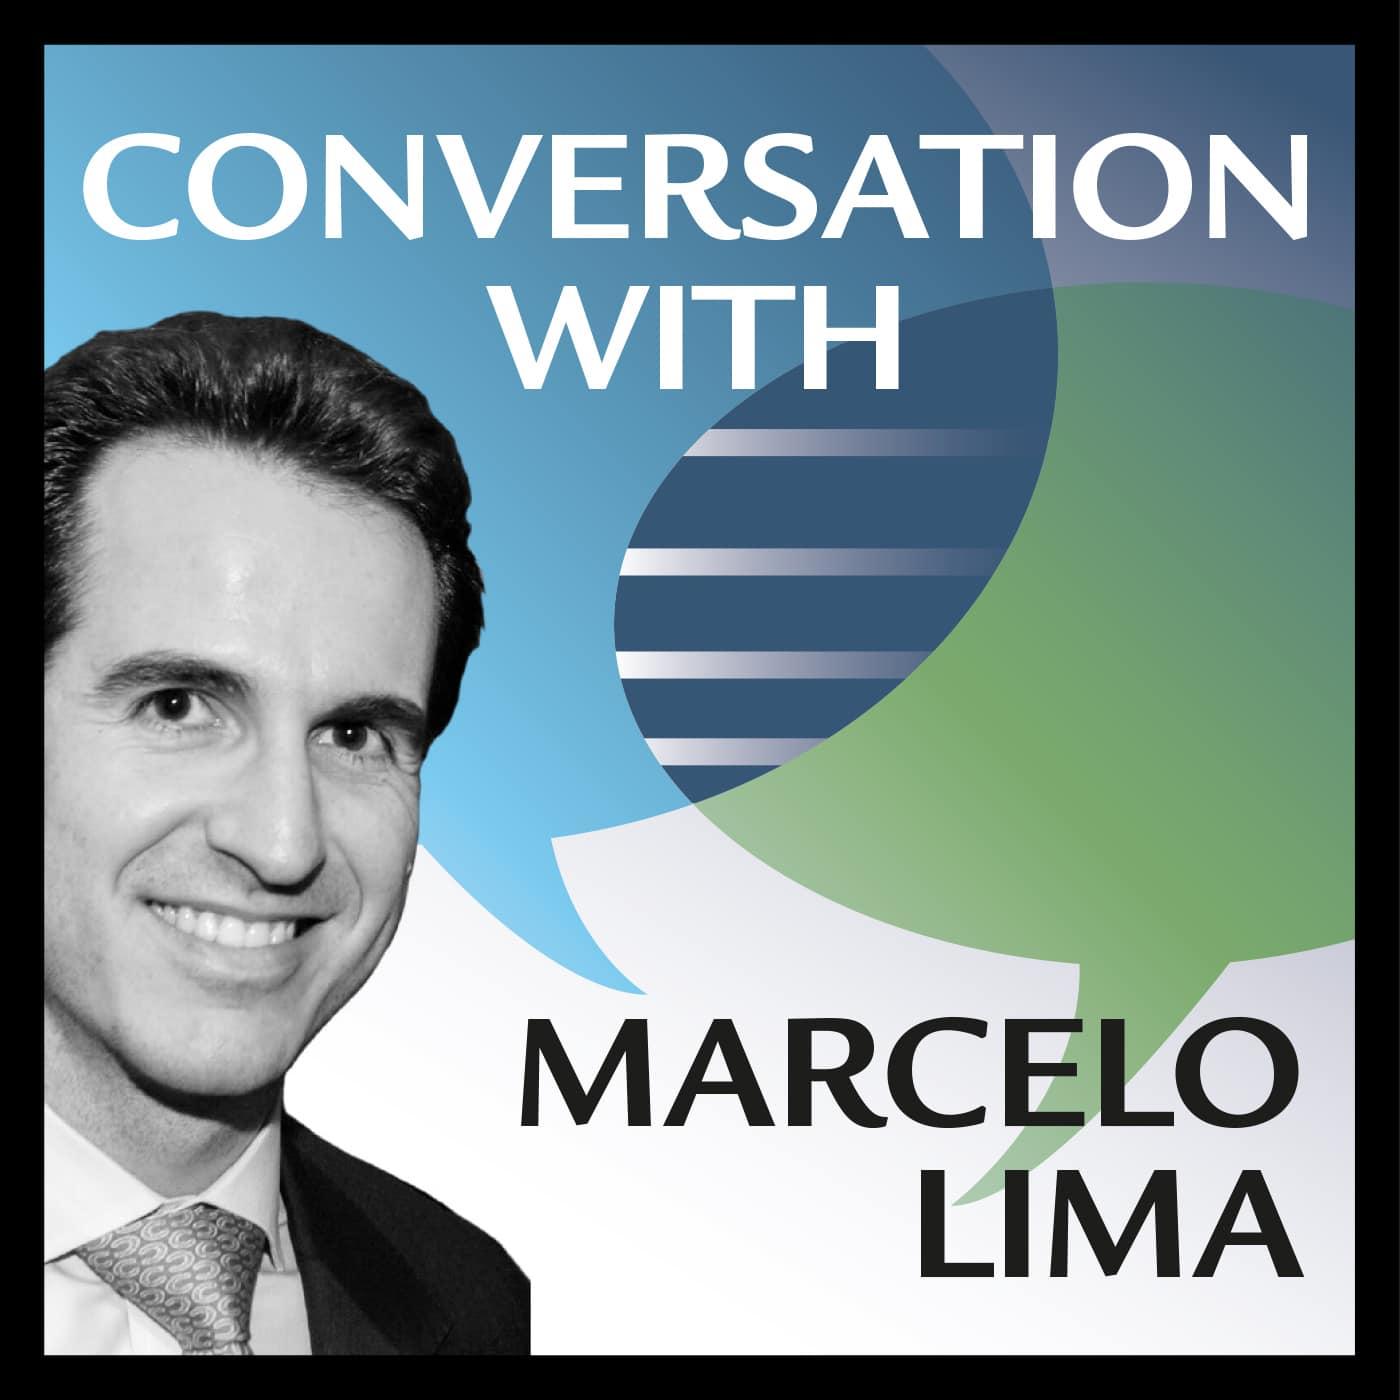 Marcelo Lima: Opening up after Coronavirus